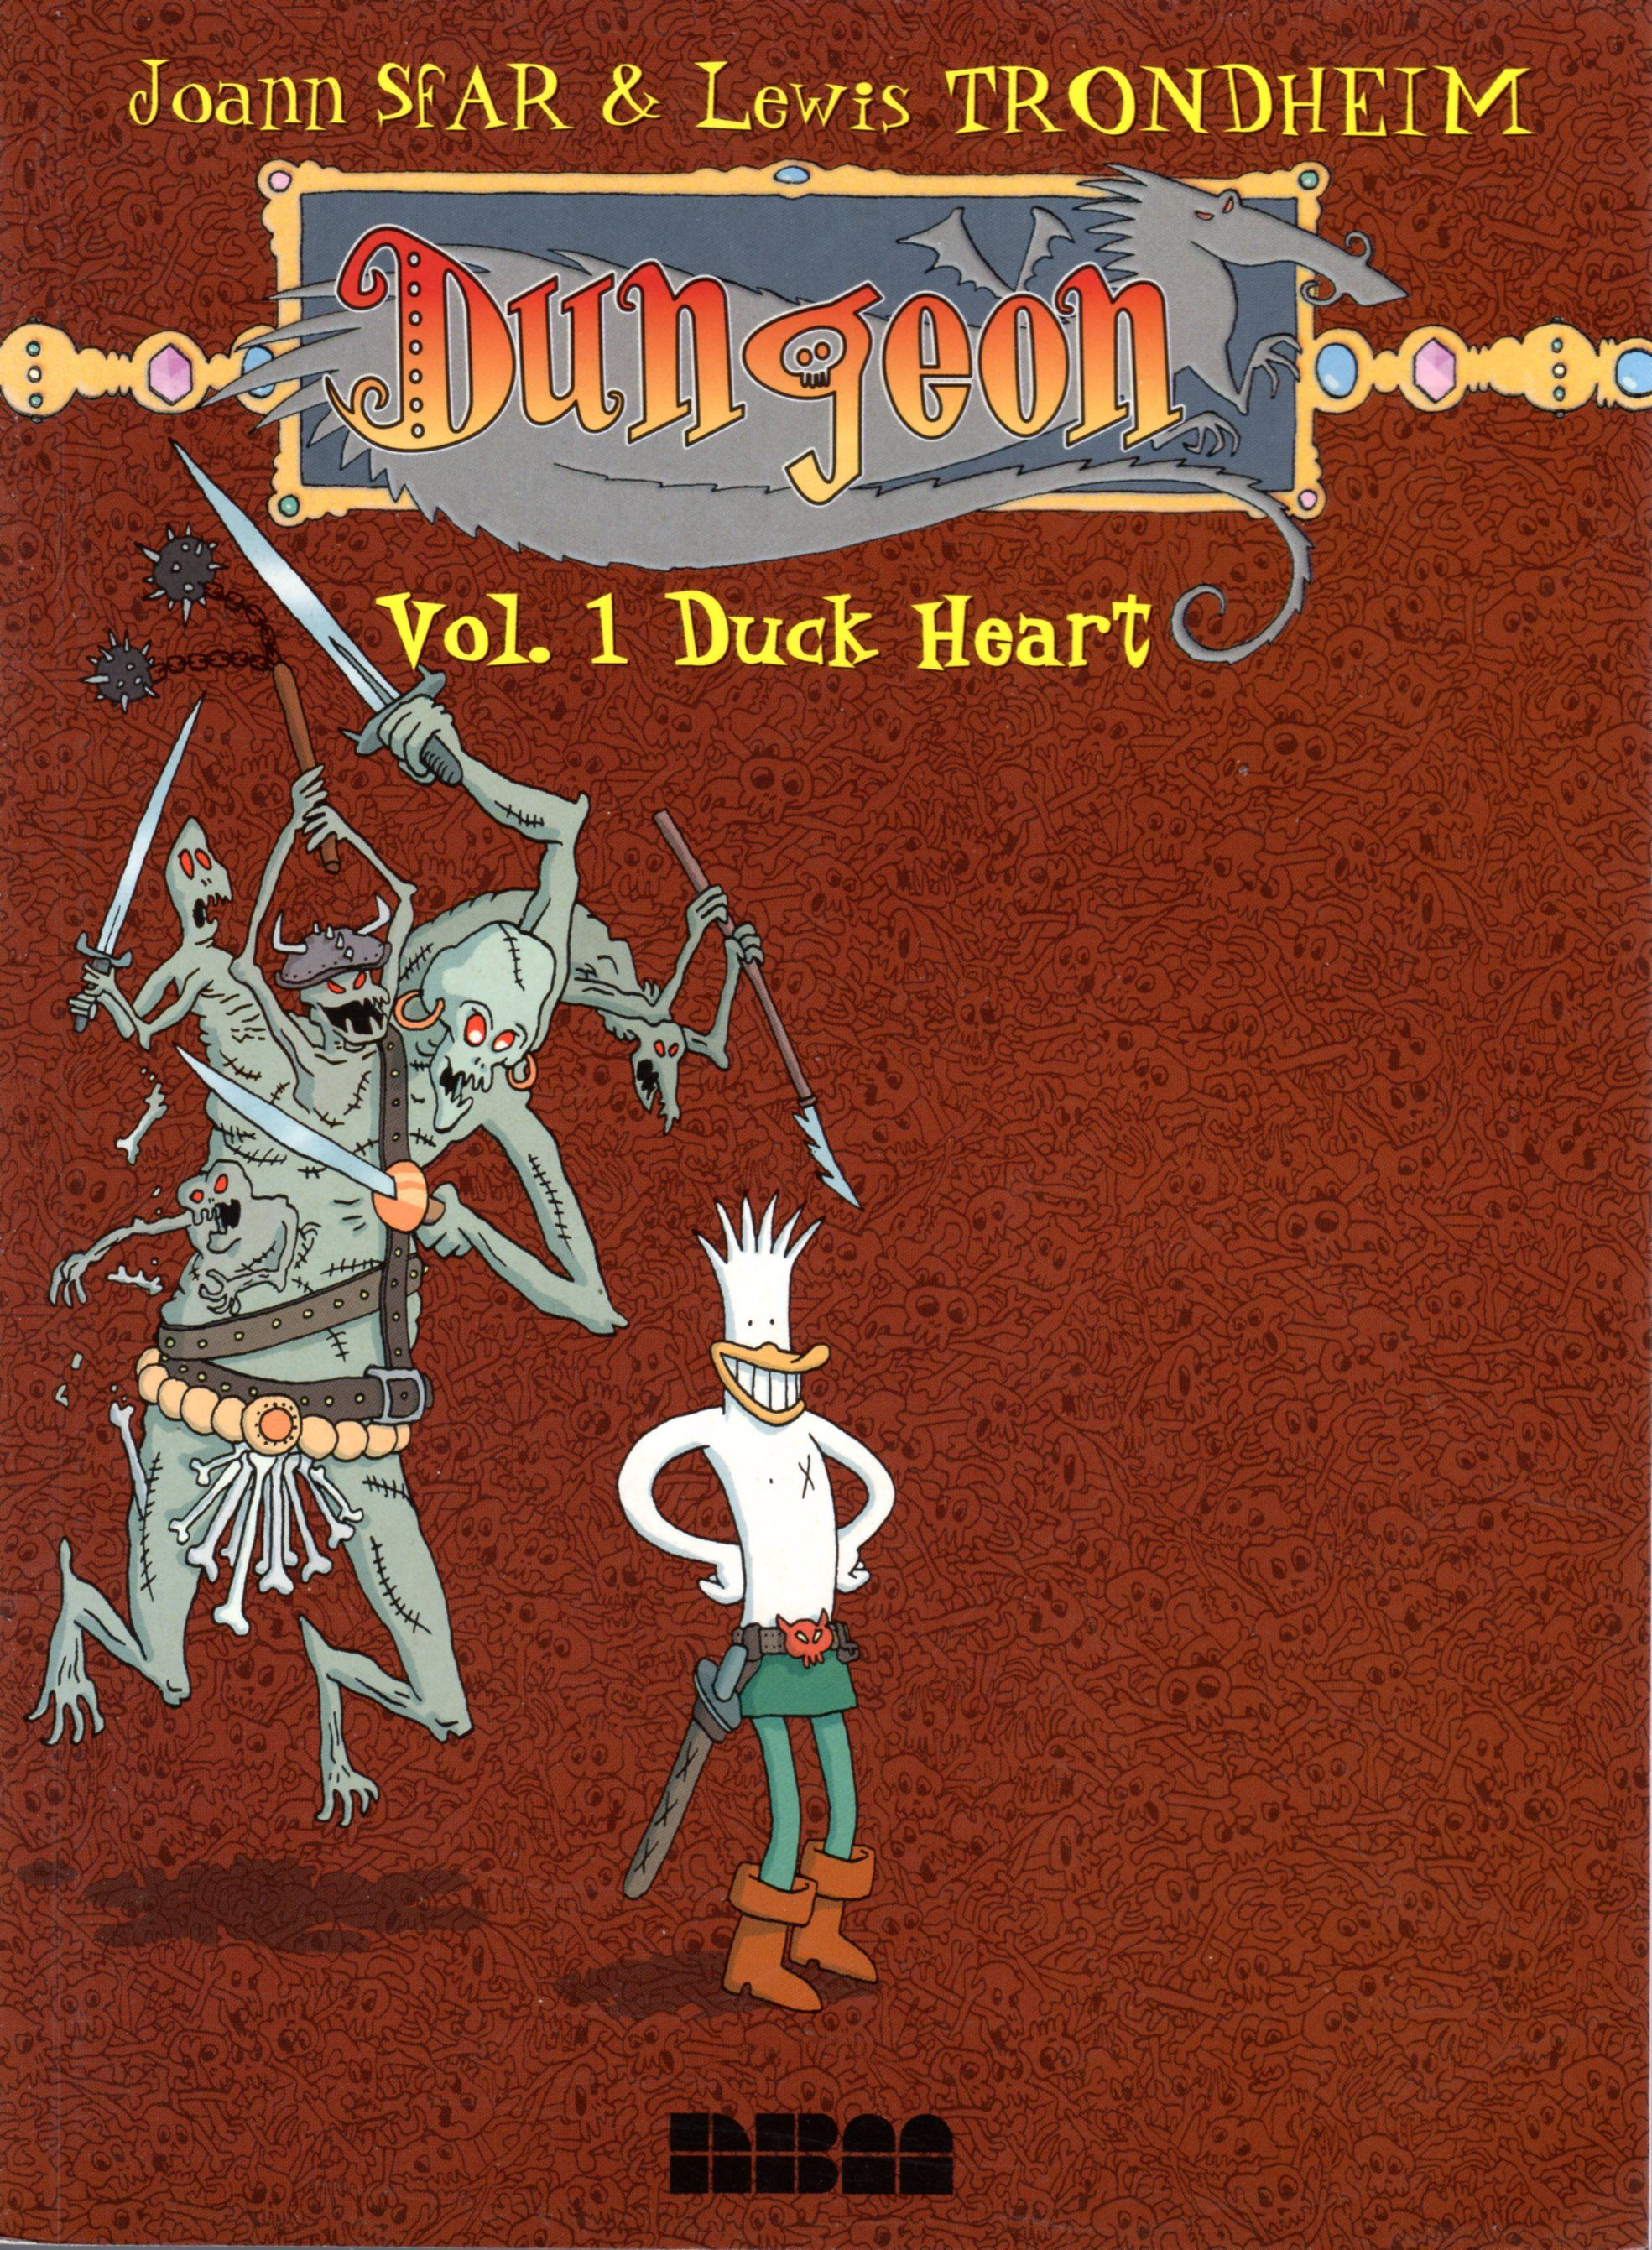 Dungeon Vol. 1 Duck Heart Joann Sfar & Lewis Trondheim